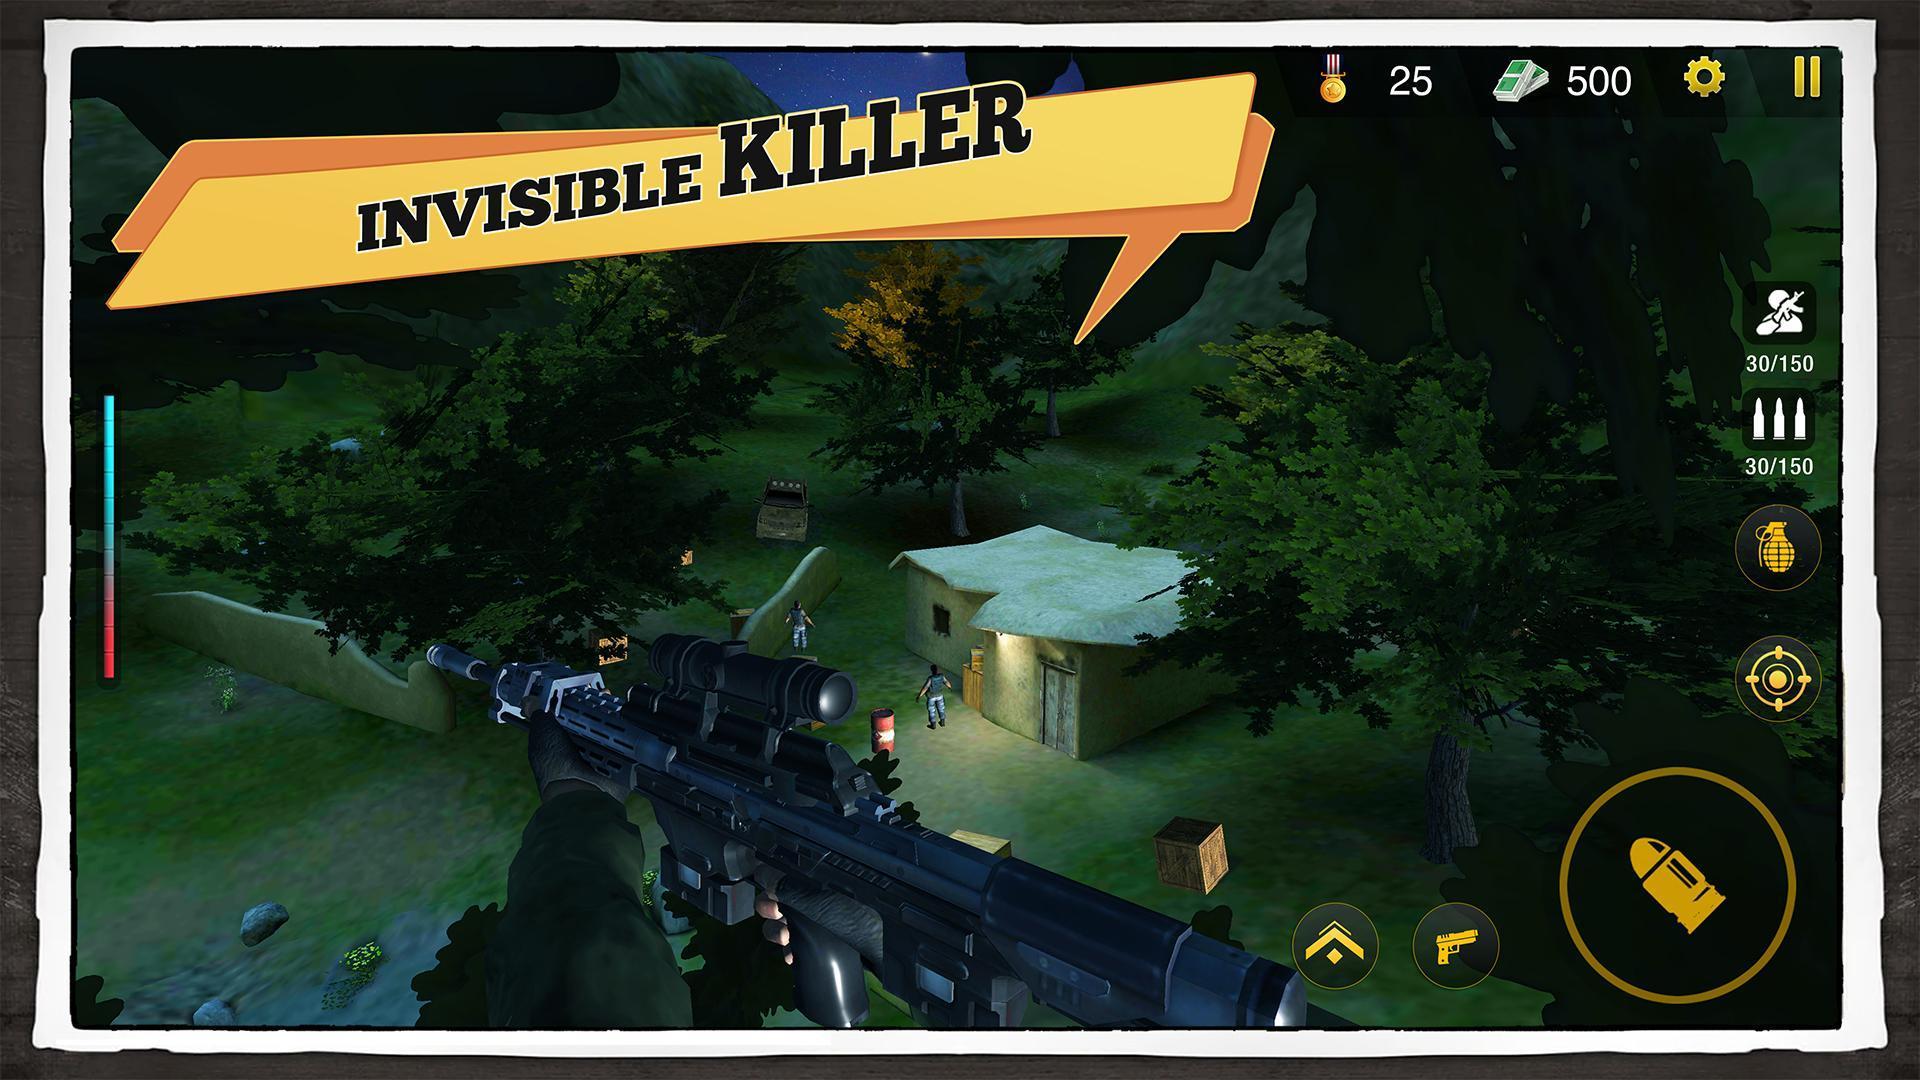 Yalghaar Delta IGI Commando Adventure Mobile Game 3.4 Screenshot 16